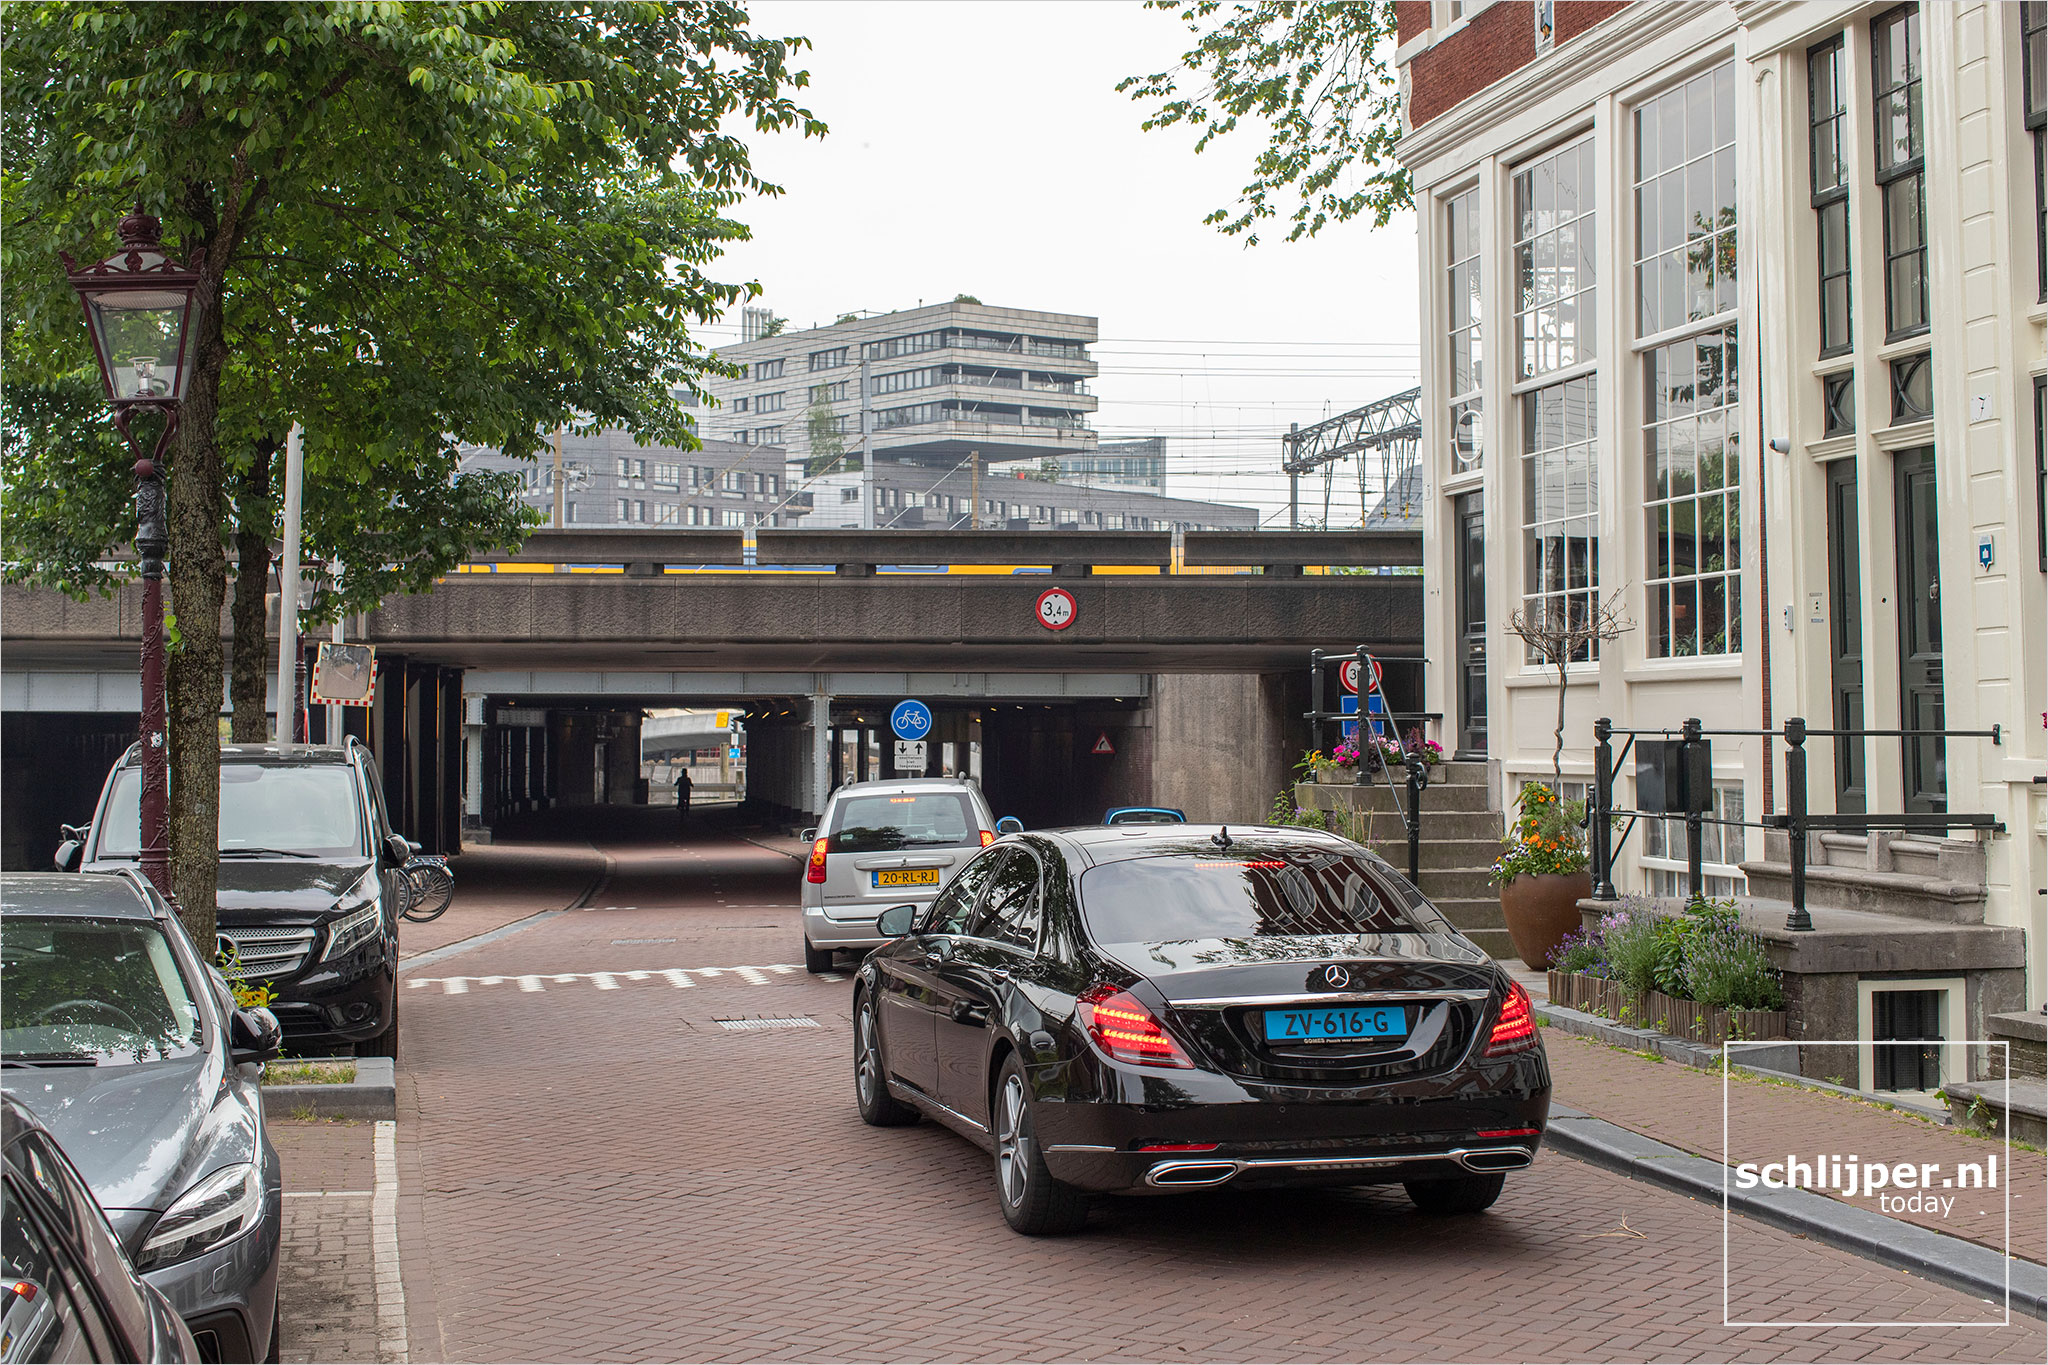 The Netherlands, Amsterdam, 25 juni 2021